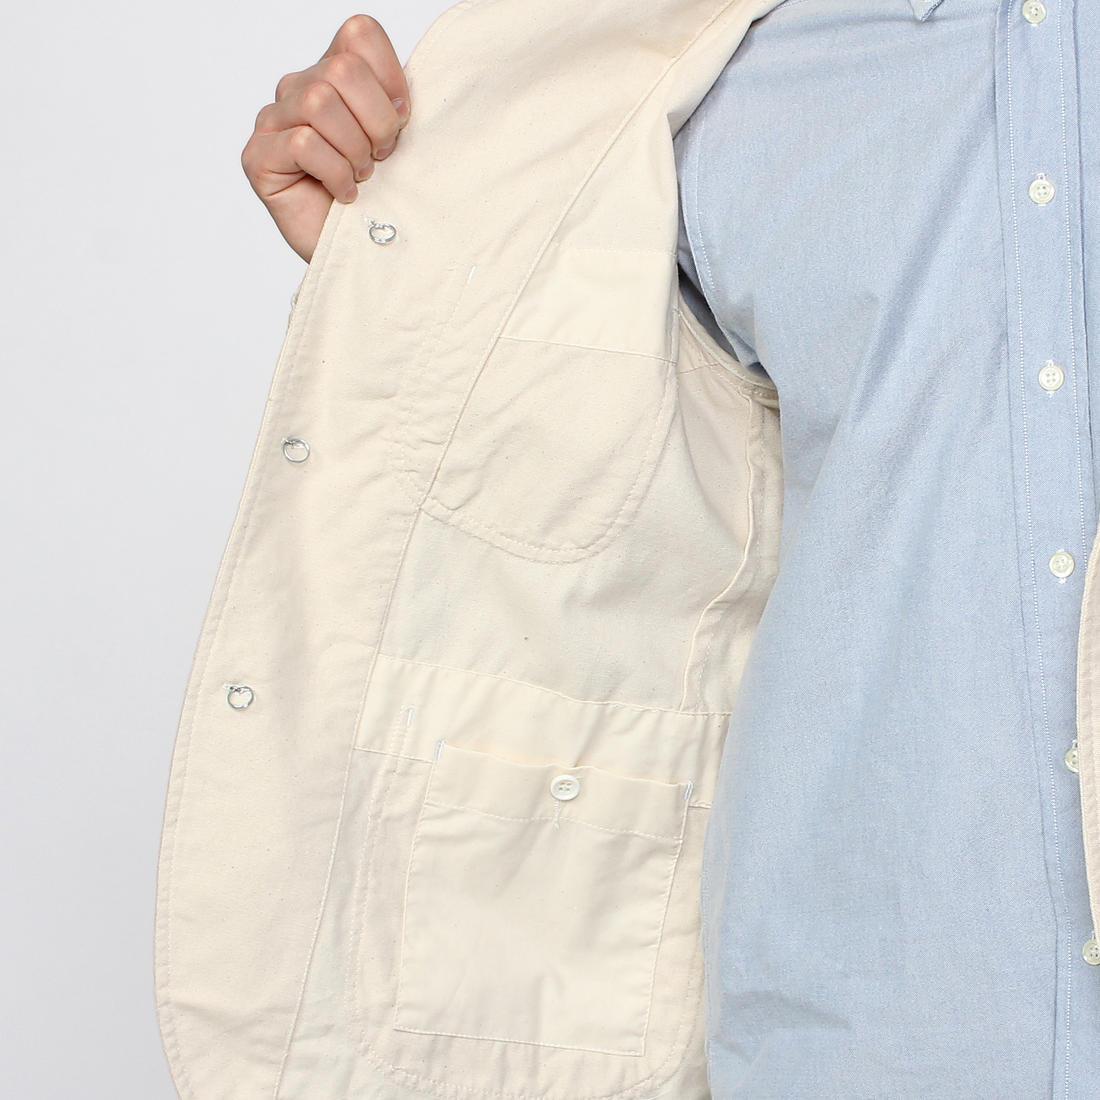 Bedford Jacket 1158631: Ivory